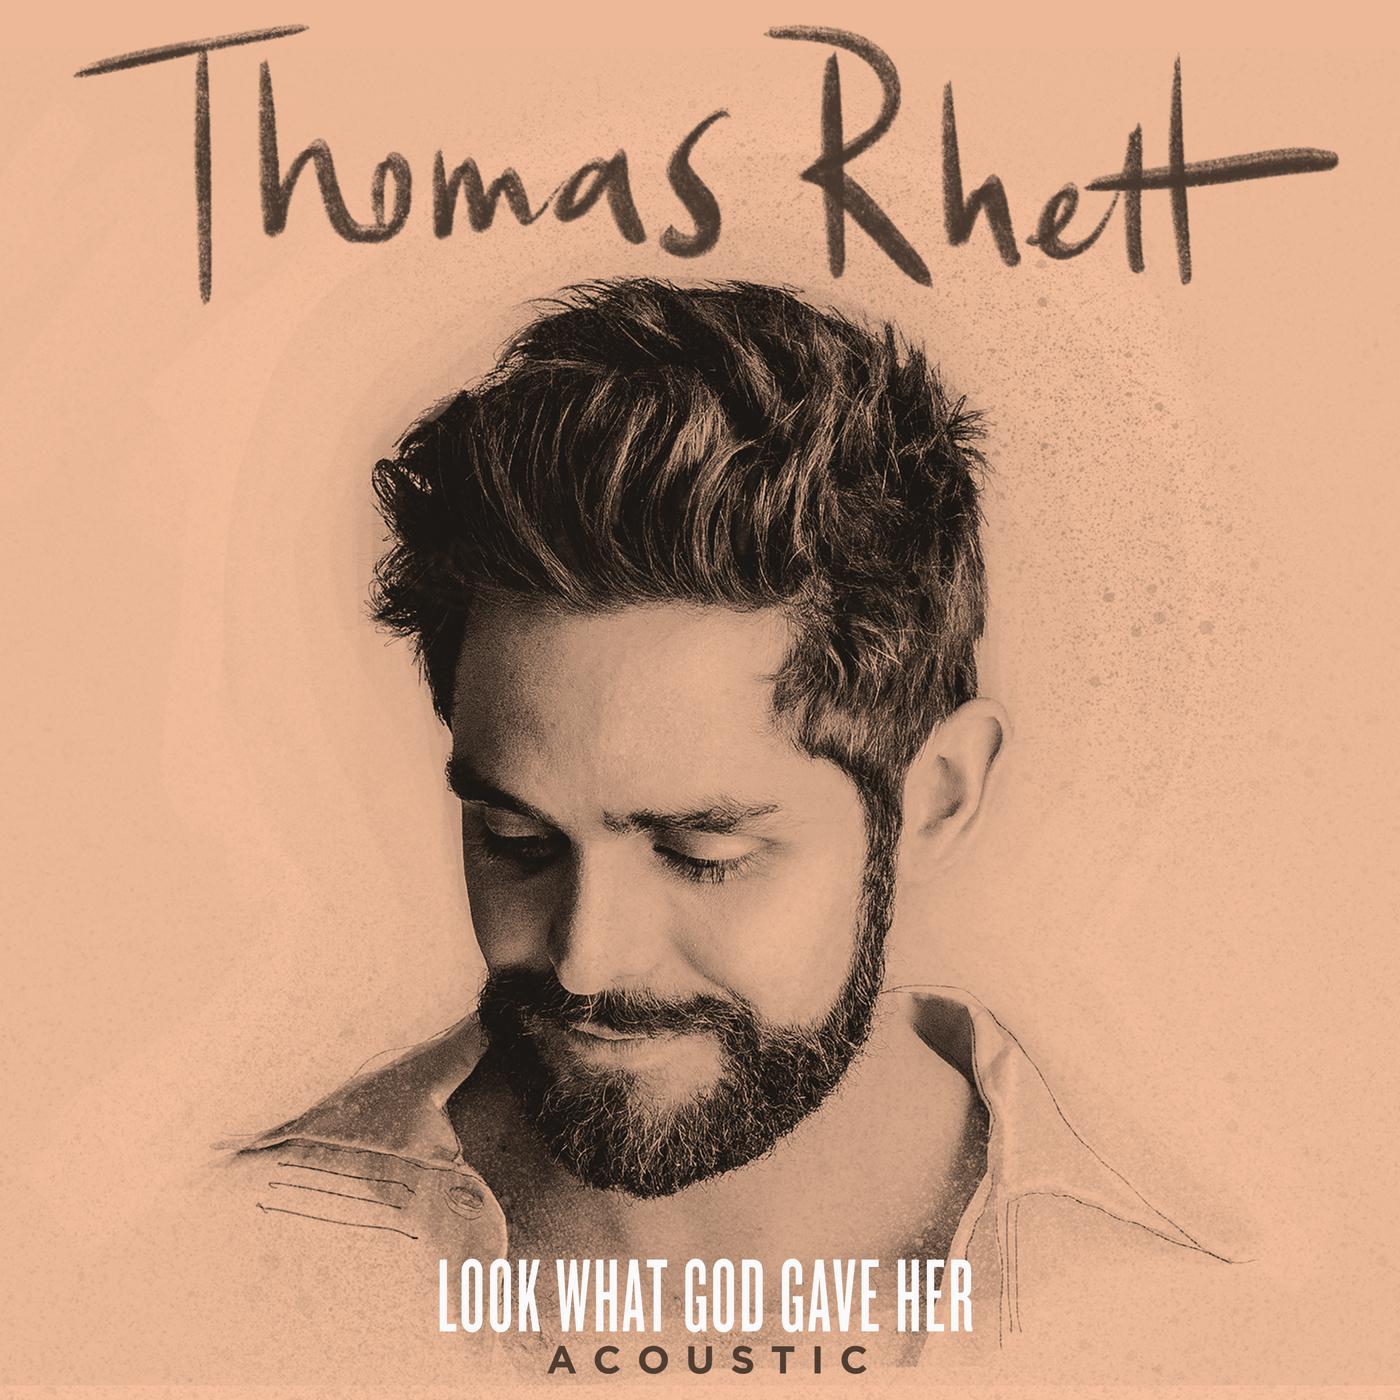 Thomas Rhett Radio: Listen to Free Music & Get The Latest